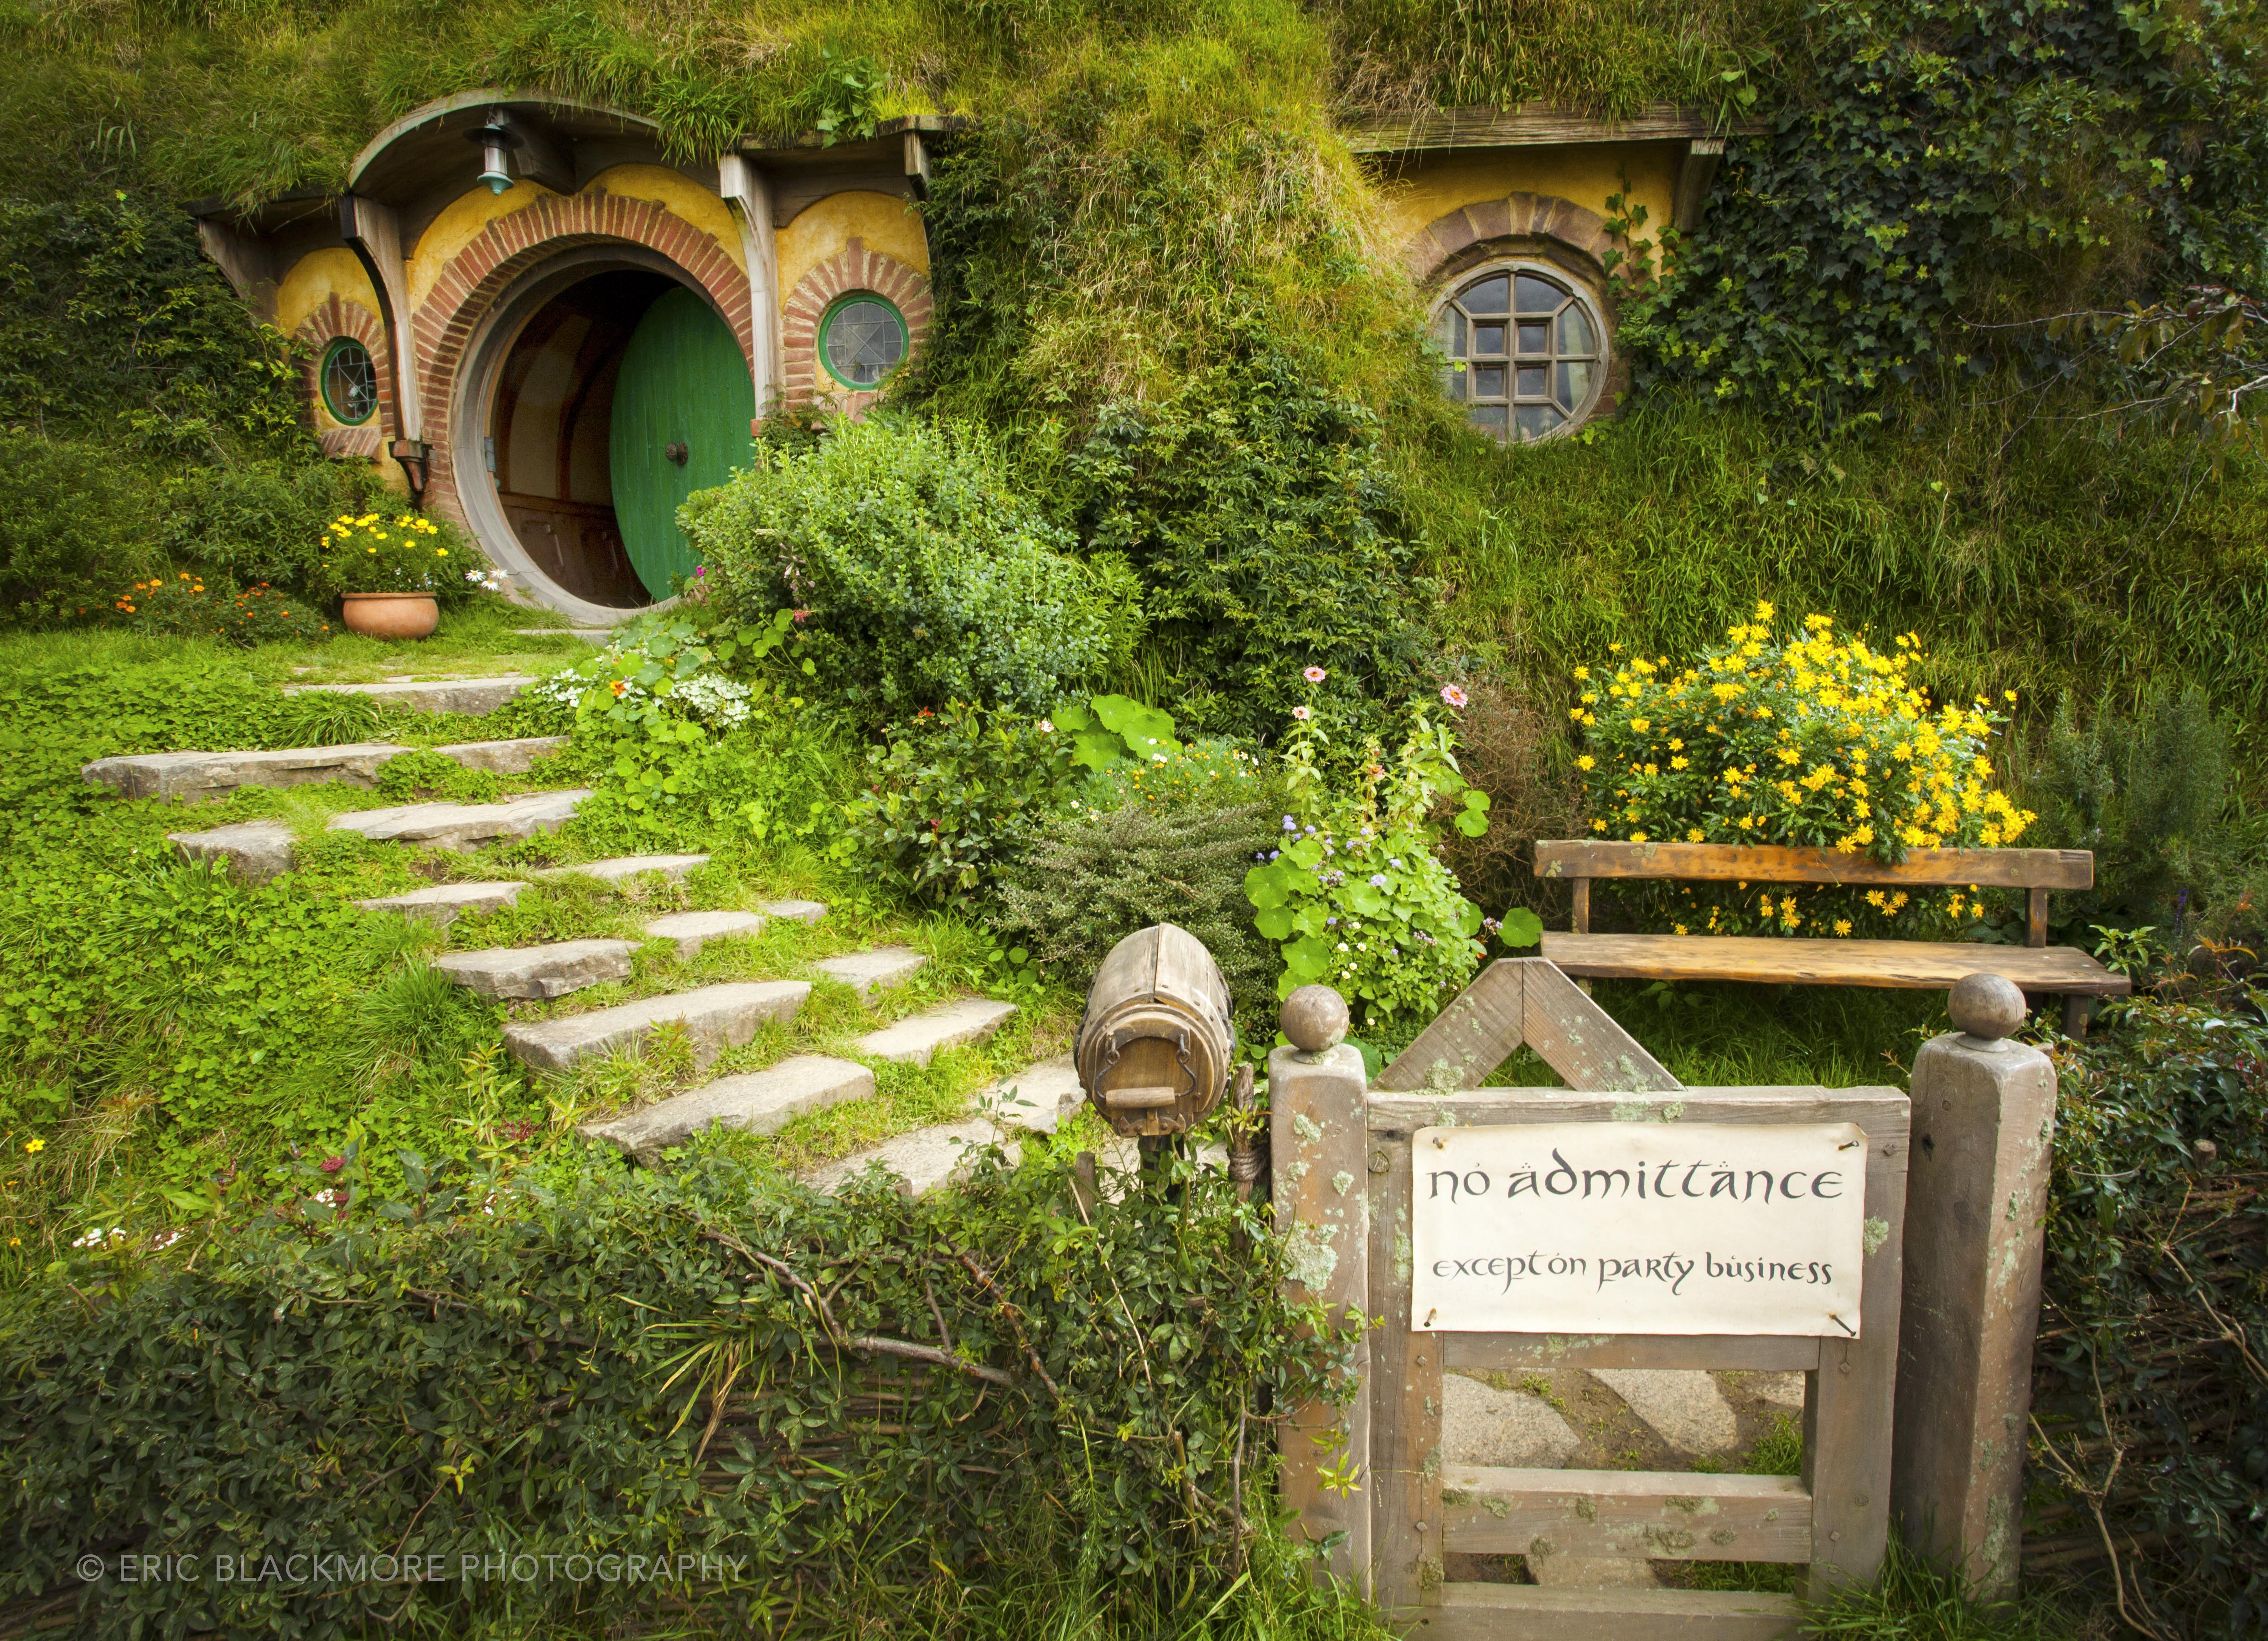 The Movie Set Of Hobbiton In Matamata New Zealand Eric